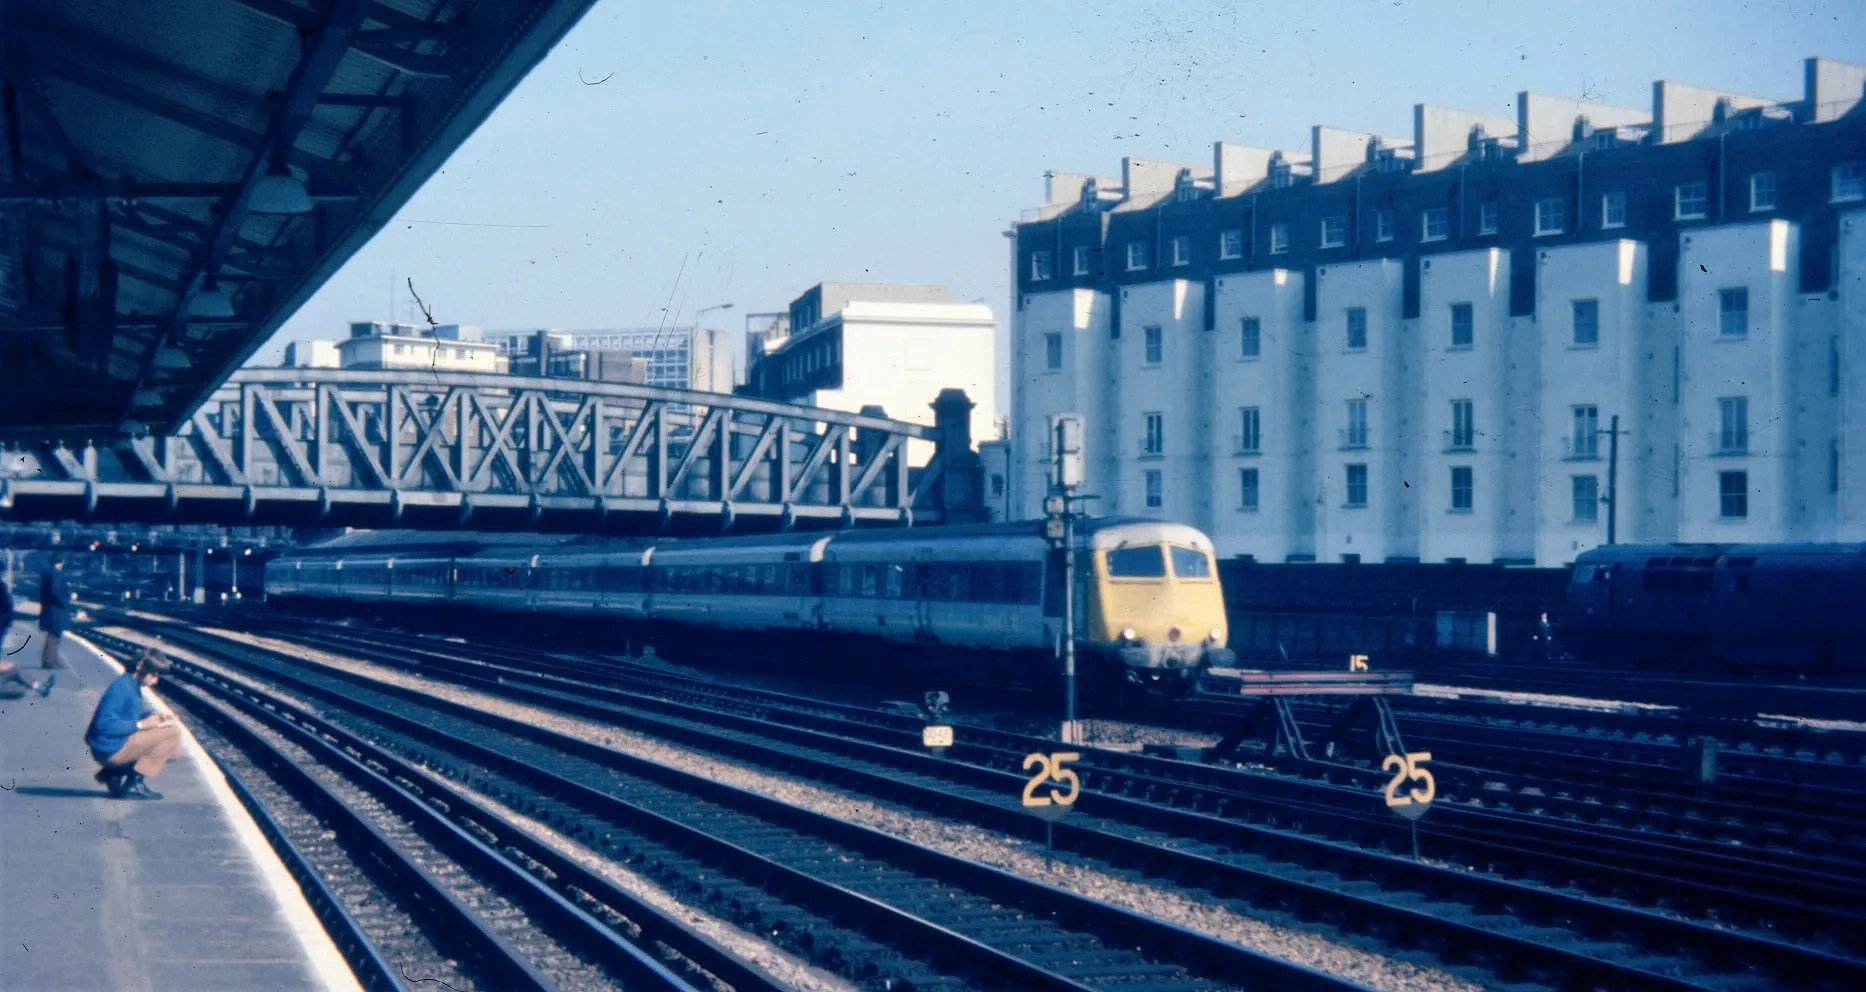 Metro Cammell Pullman - Royal Oak station - British Railway photo